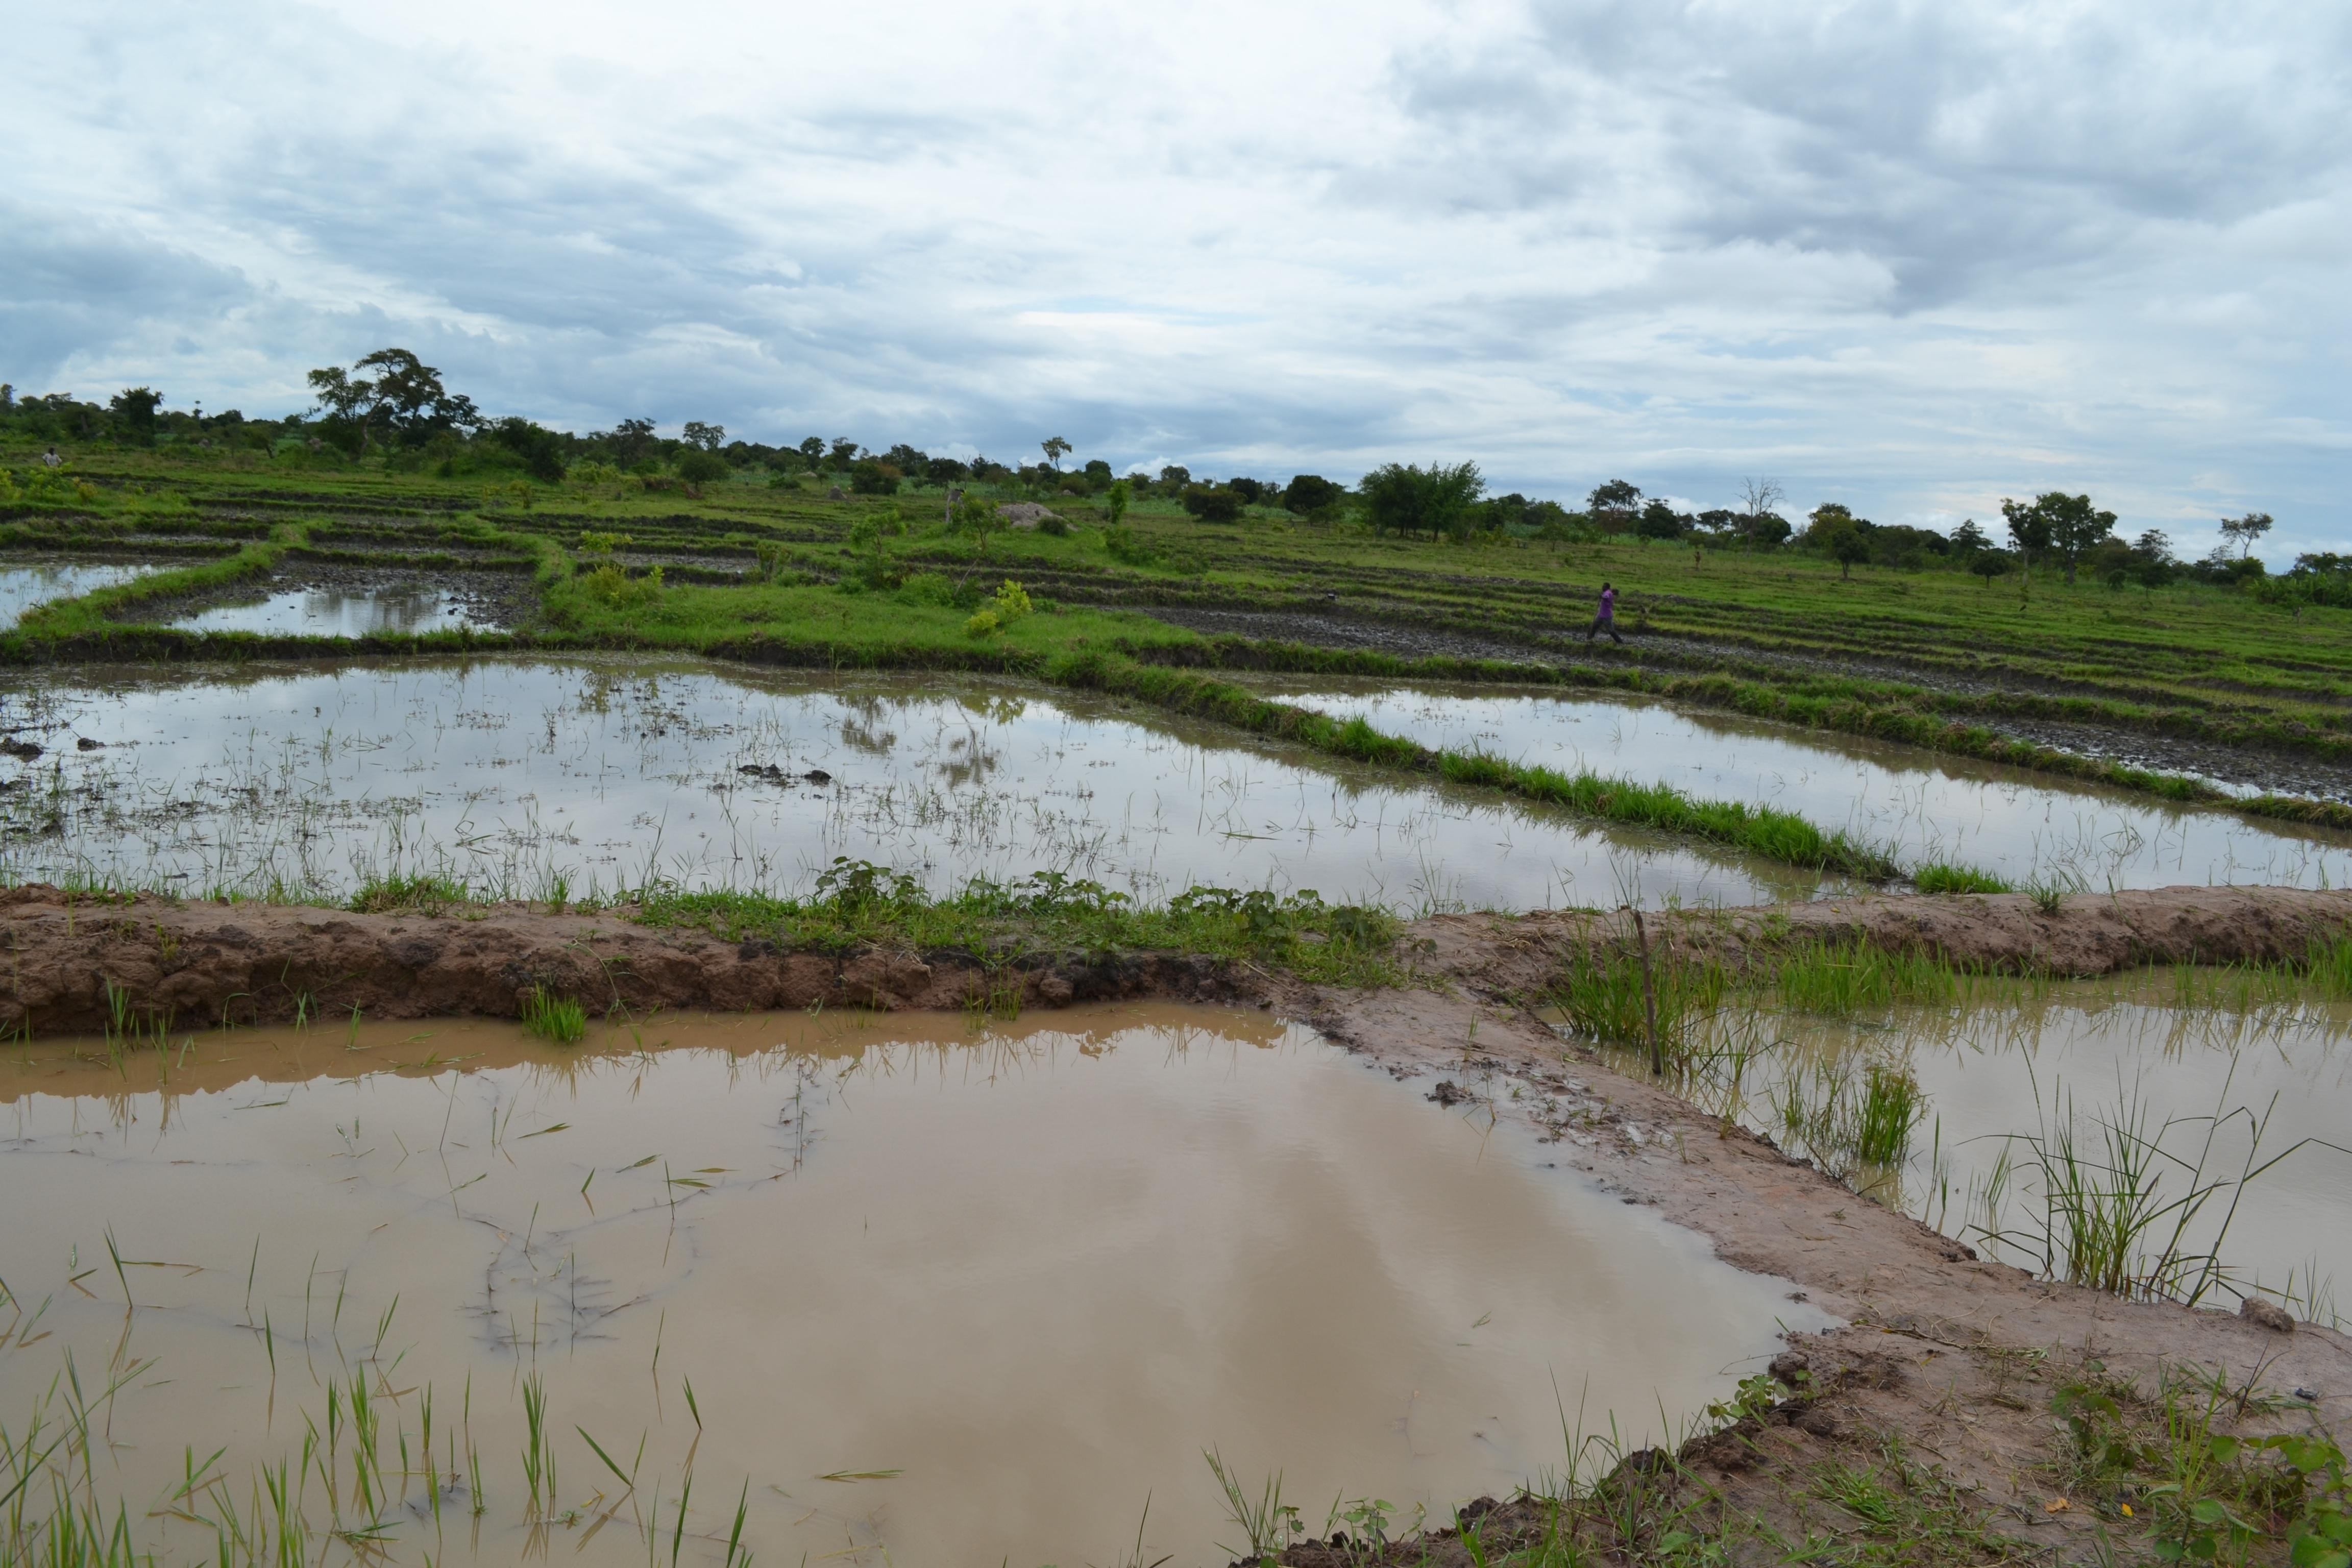 A_fish_pond_in_Lulembela_Village-1.jpg